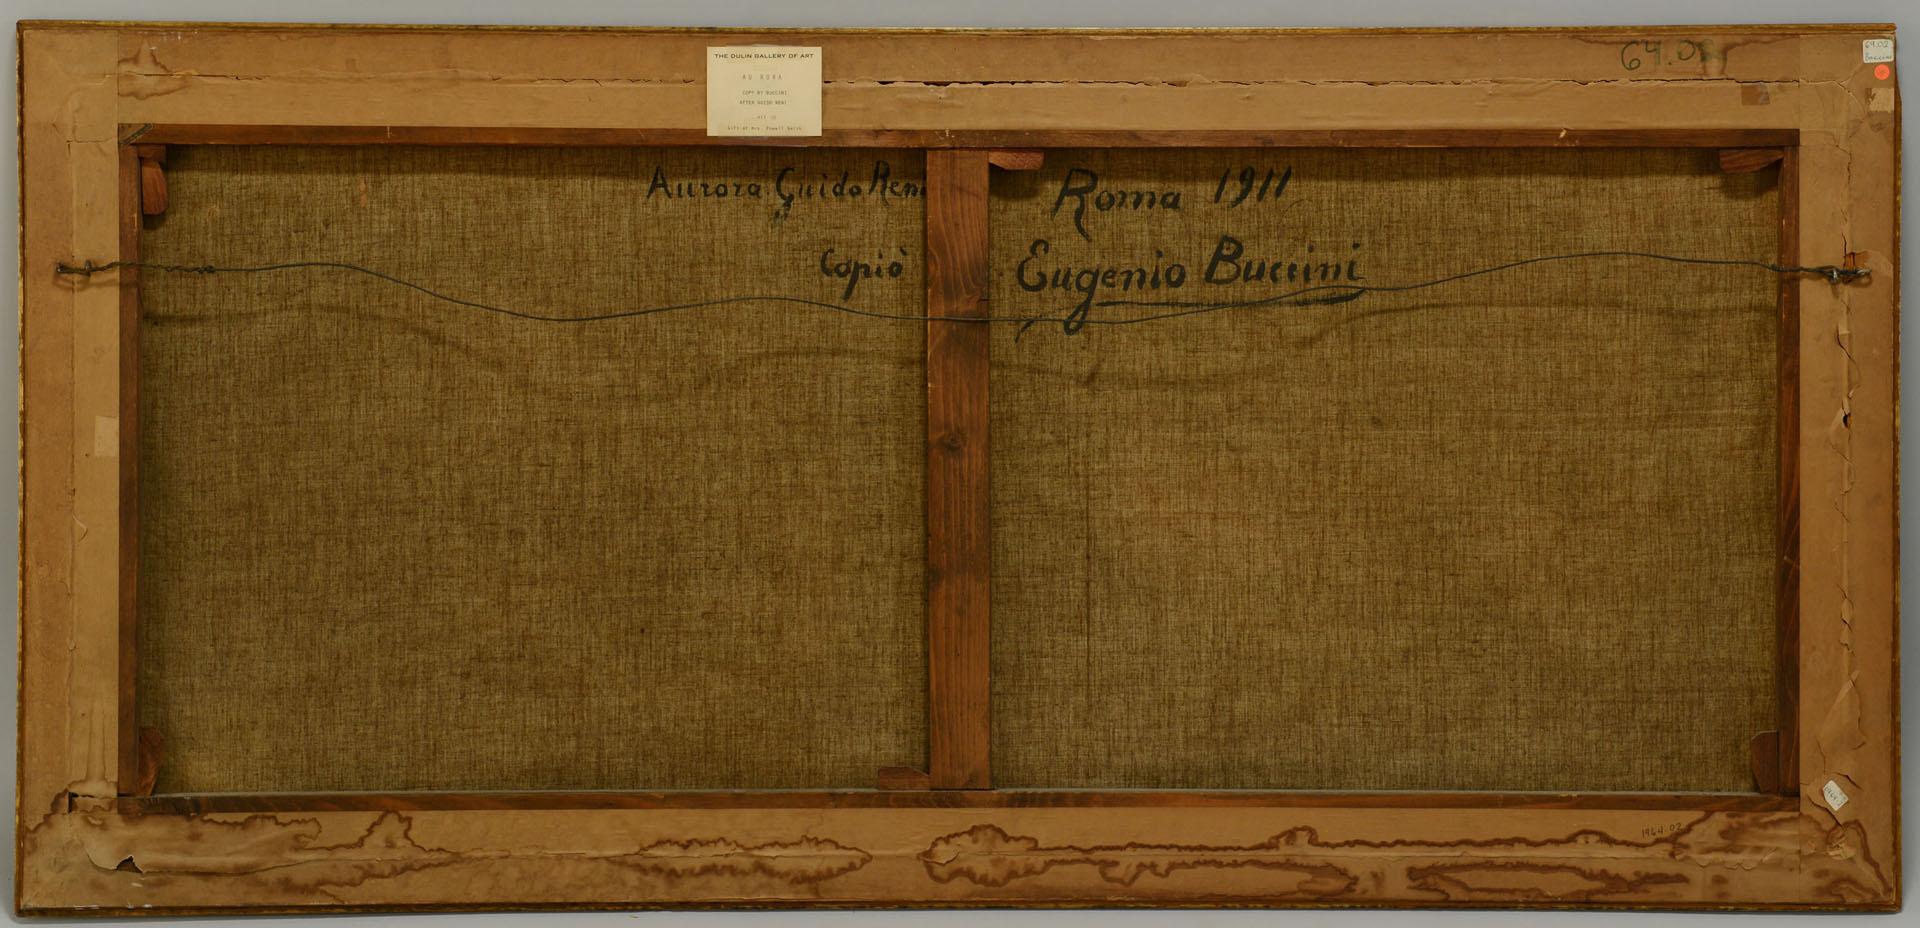 Lot 204: Eugene Buccini Oil on Canvas, Aurora